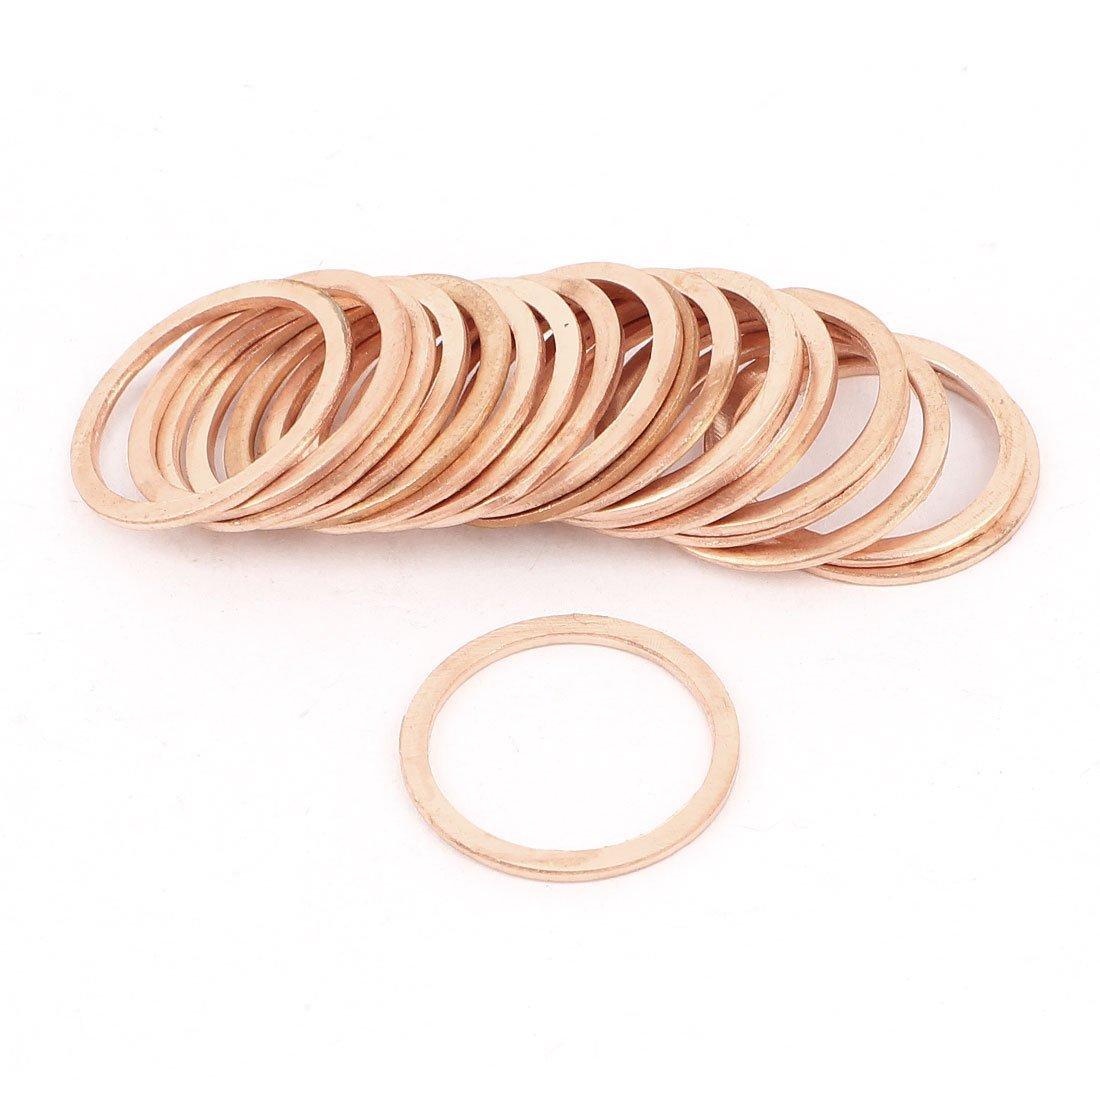 Copper Washer - TOOGOO(R) Tattoo Machine Copper Crush Washer Flat Ring 16mmx20mmx1mm 20 Pcs